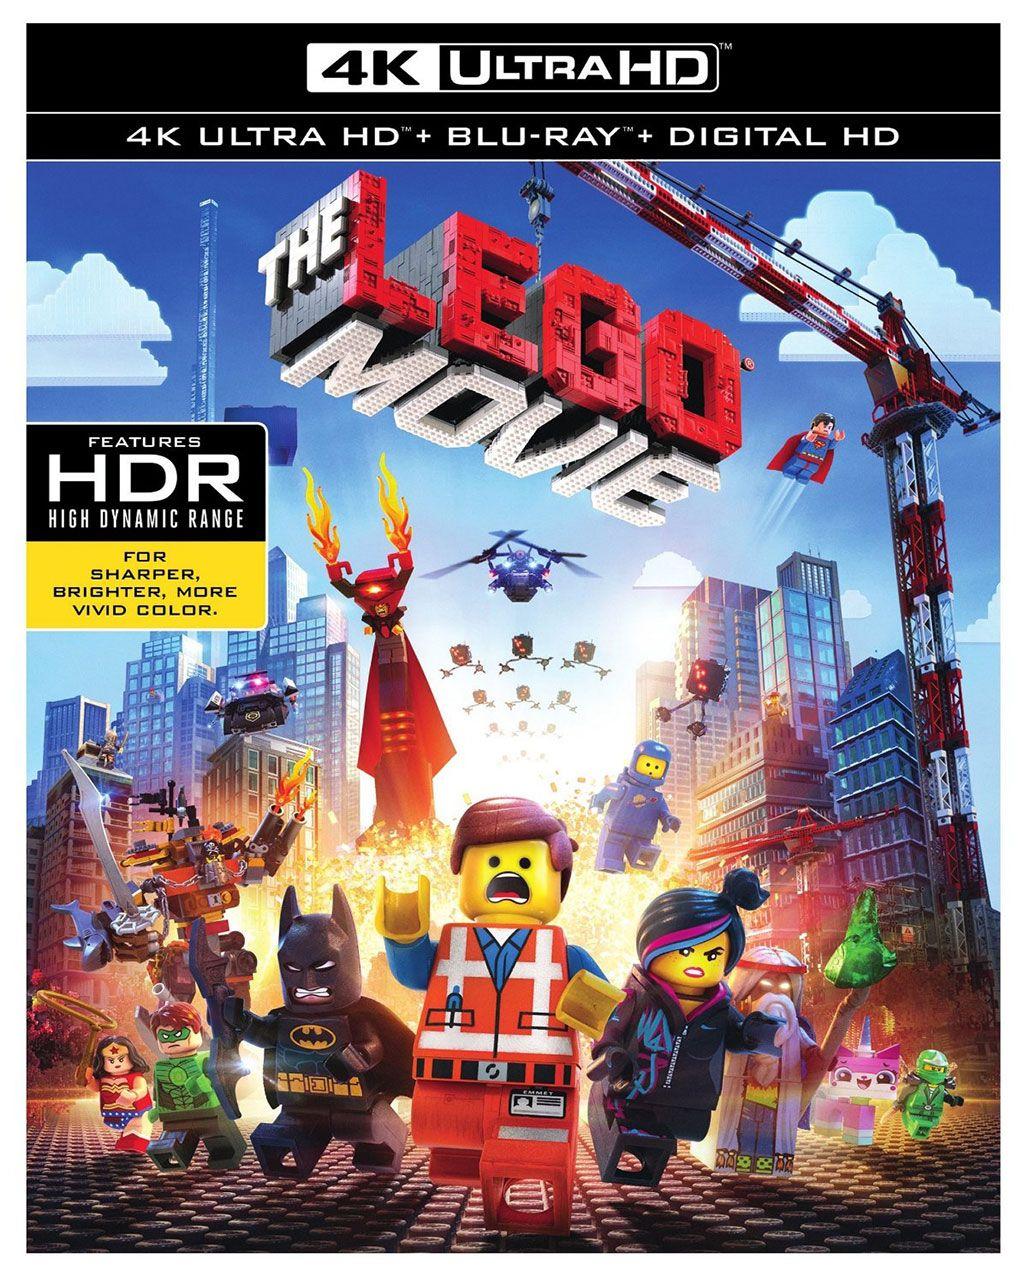 [4K Blu Ray] The Lego Movie - £4.99 - eBay/Boss Deals